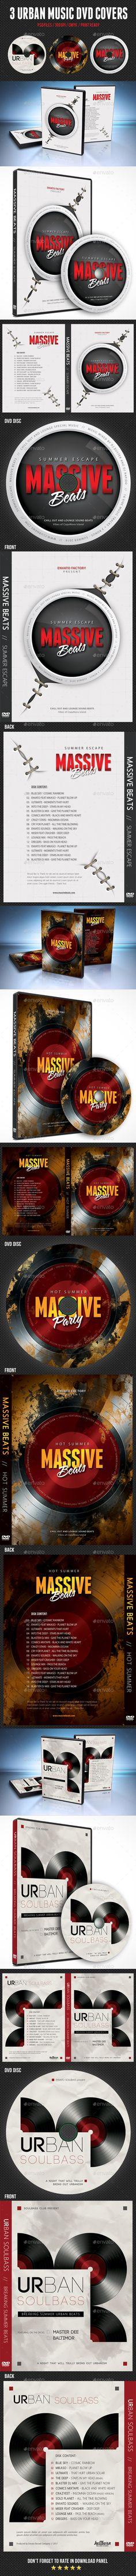 3 Urban Music DVD Covers Template PSD Bundle